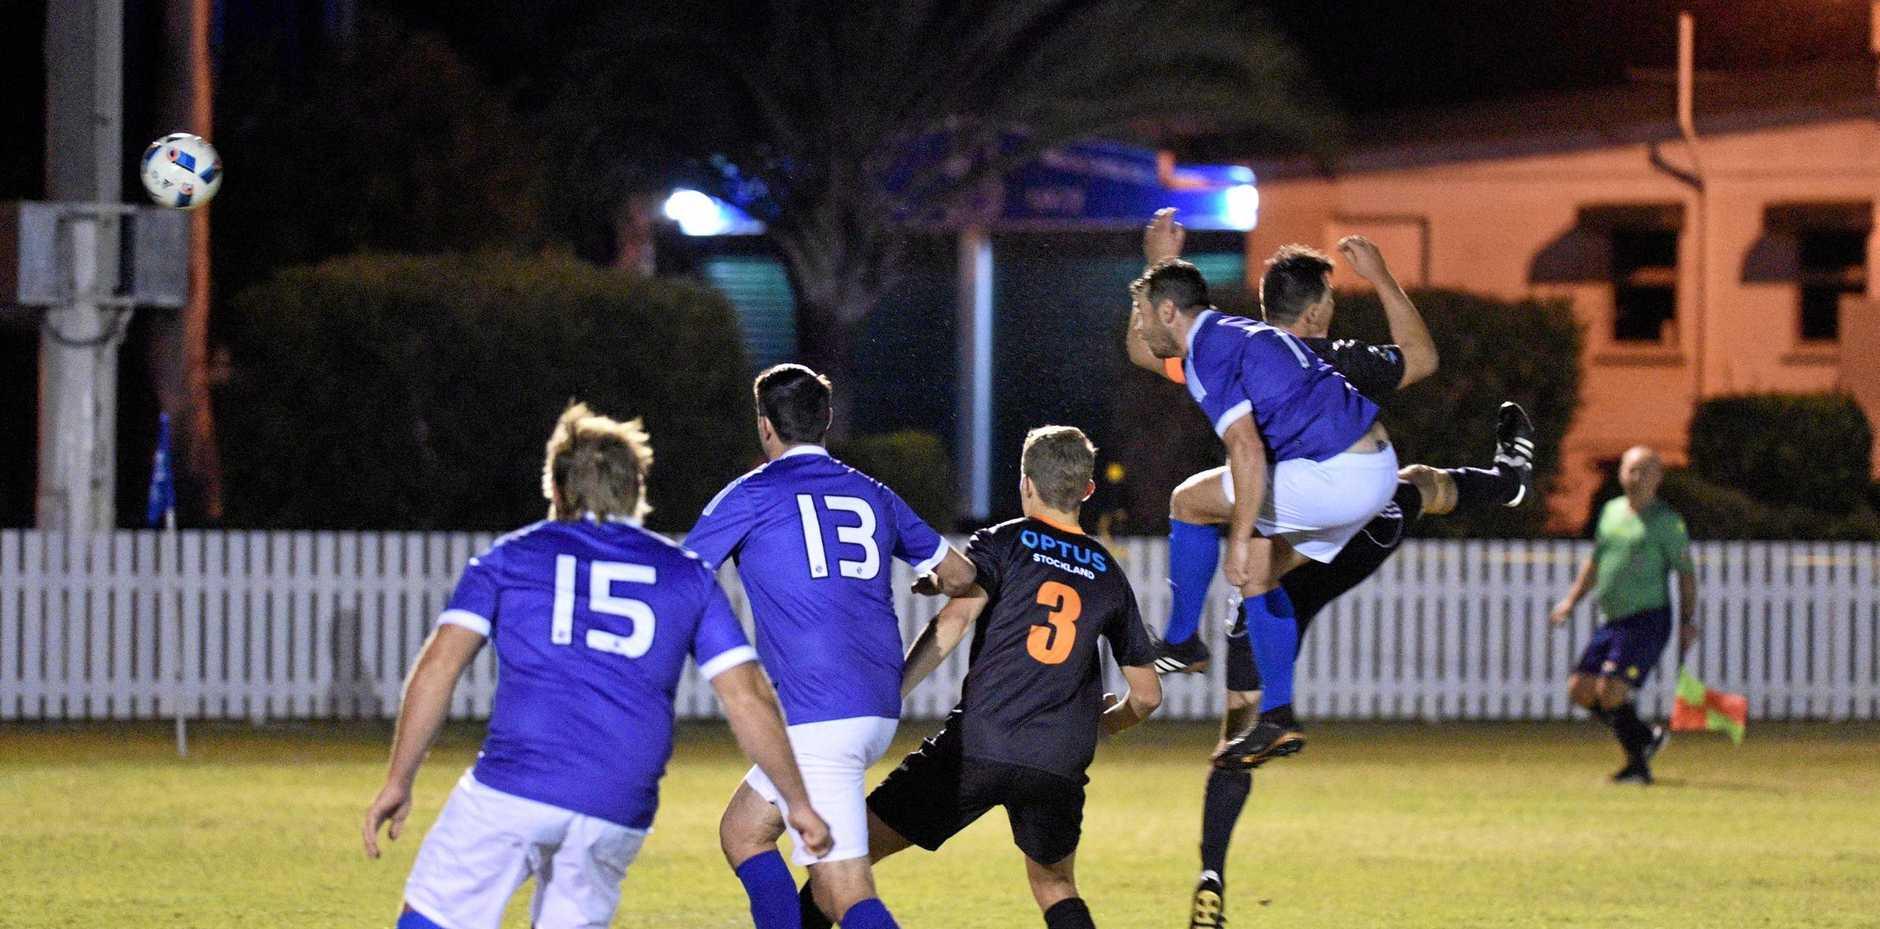 Anthony Mollee (7) heads the ball towards the goal. Sunbury v United Park Eagles (UPE) at Maryborough Cricket Club.